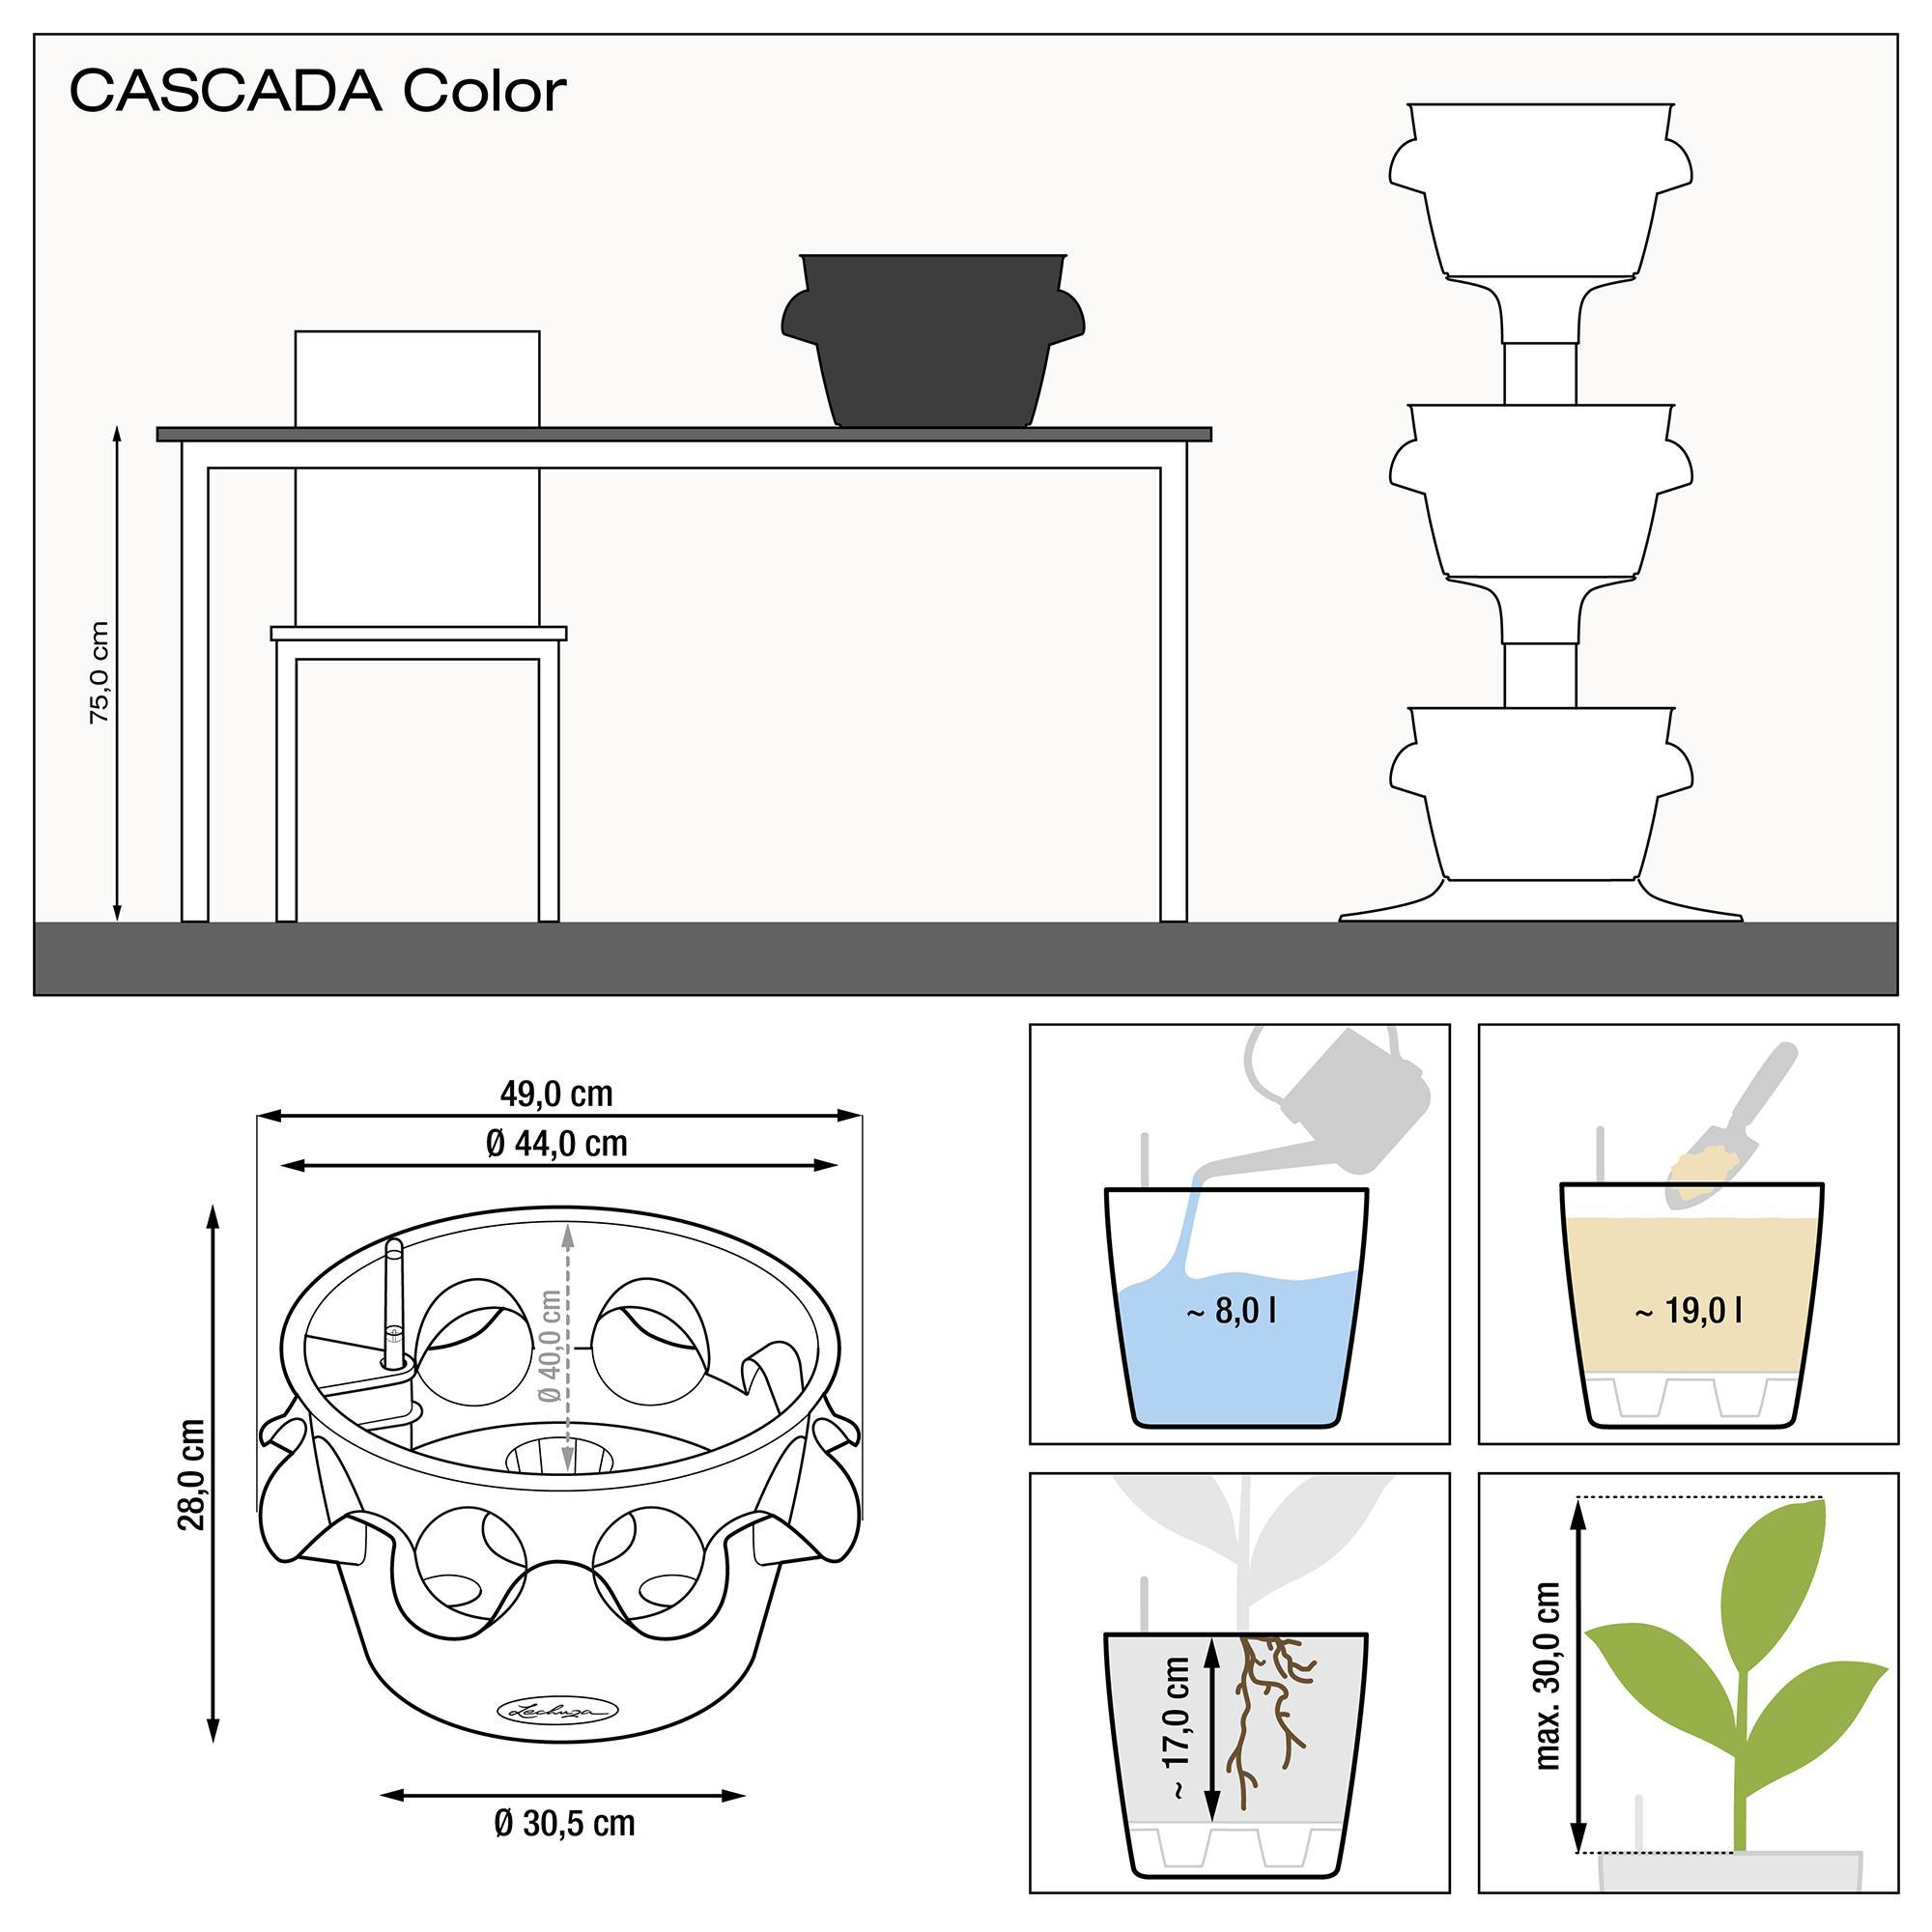 CASCADA Color slate - Image 2